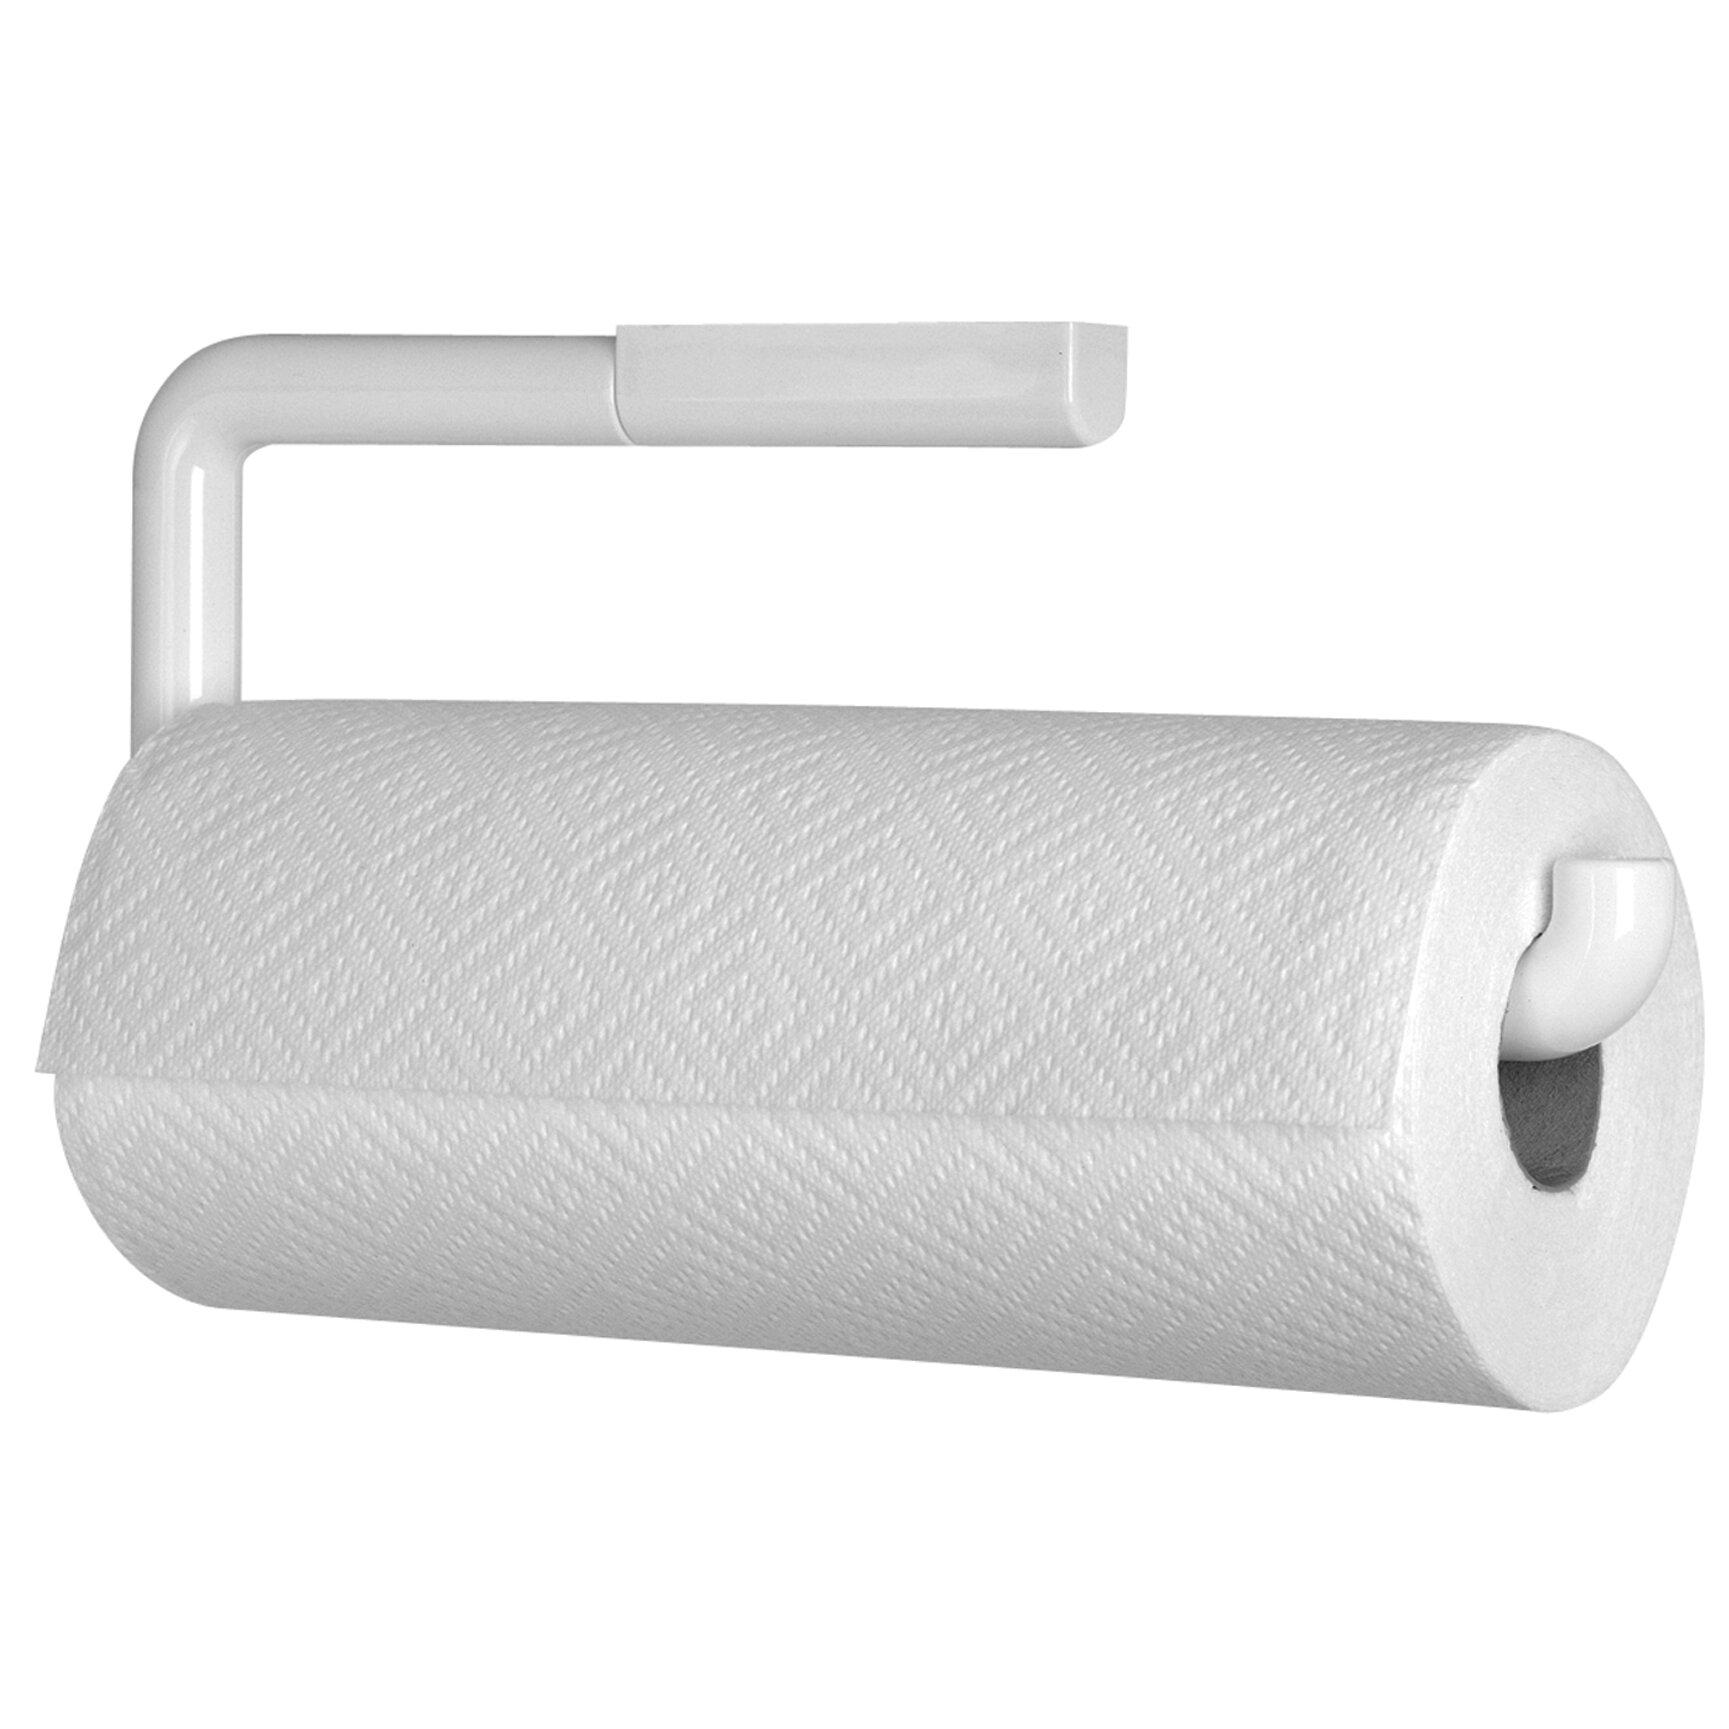 interdesign wall mounted paper holder towel reviews wayfair. Black Bedroom Furniture Sets. Home Design Ideas